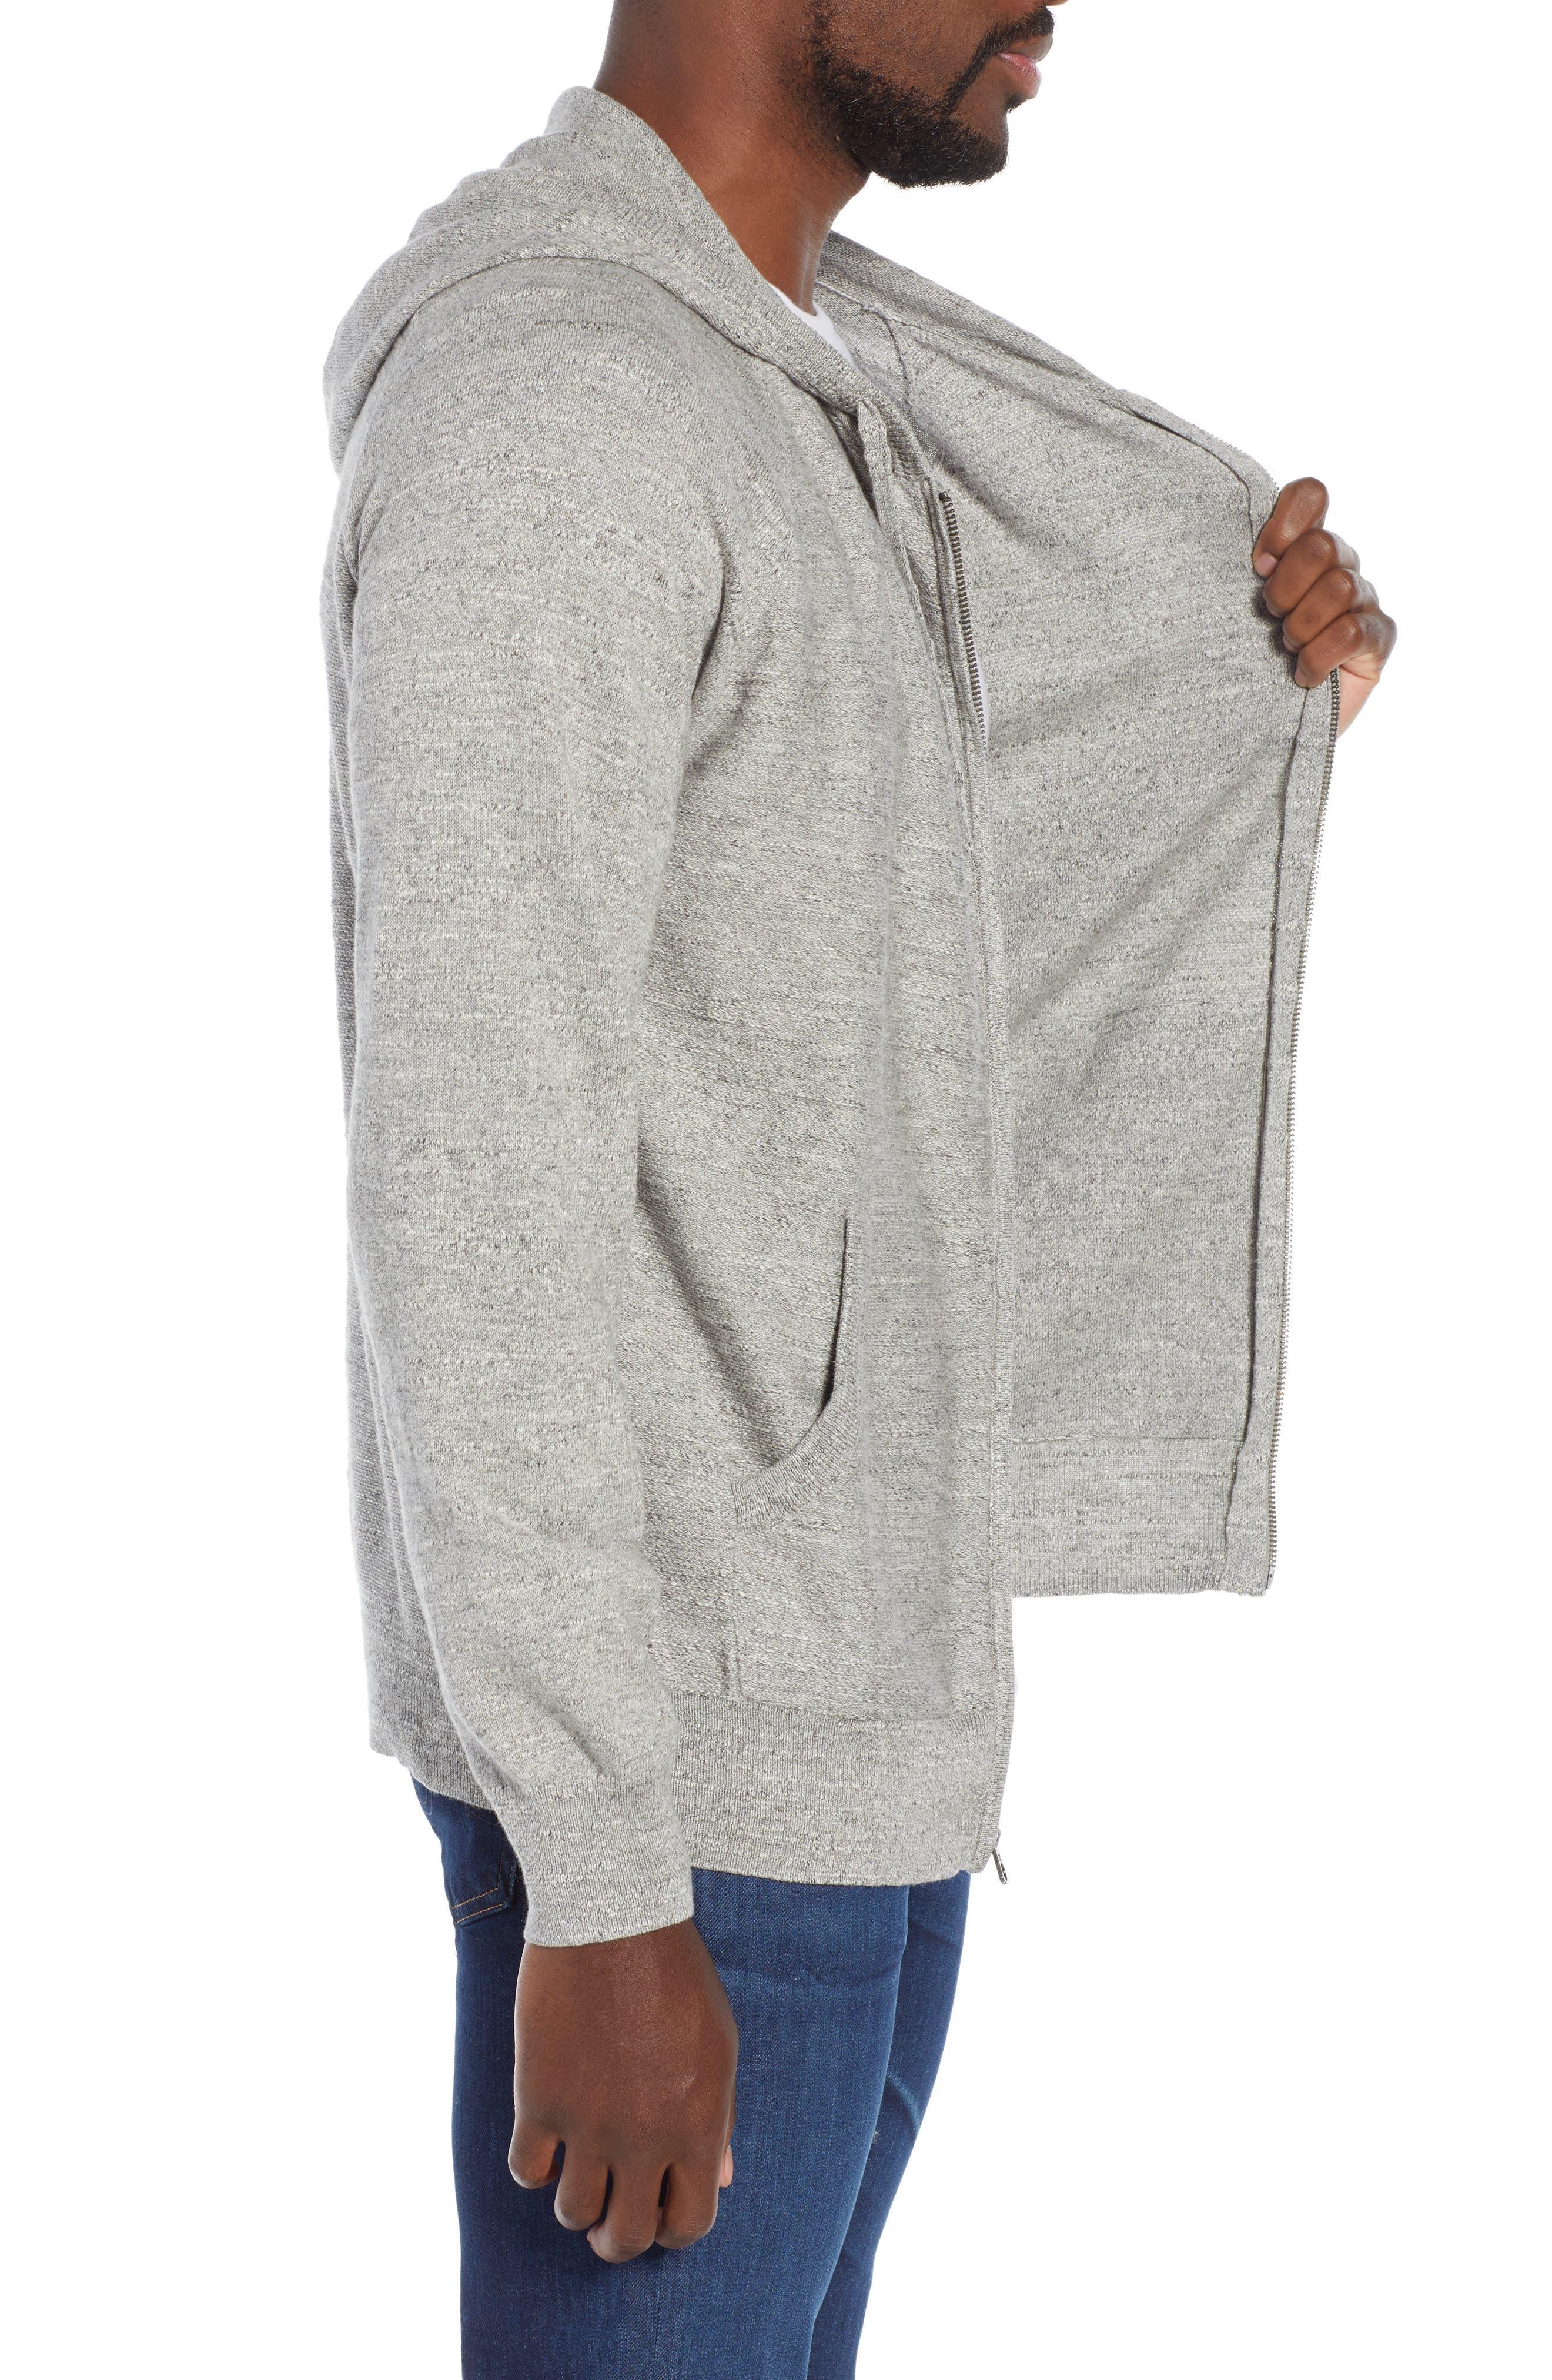 Rugged Raglan Sleeve Cotton Hoodie,                             Alternate thumbnail 3, color,                             020